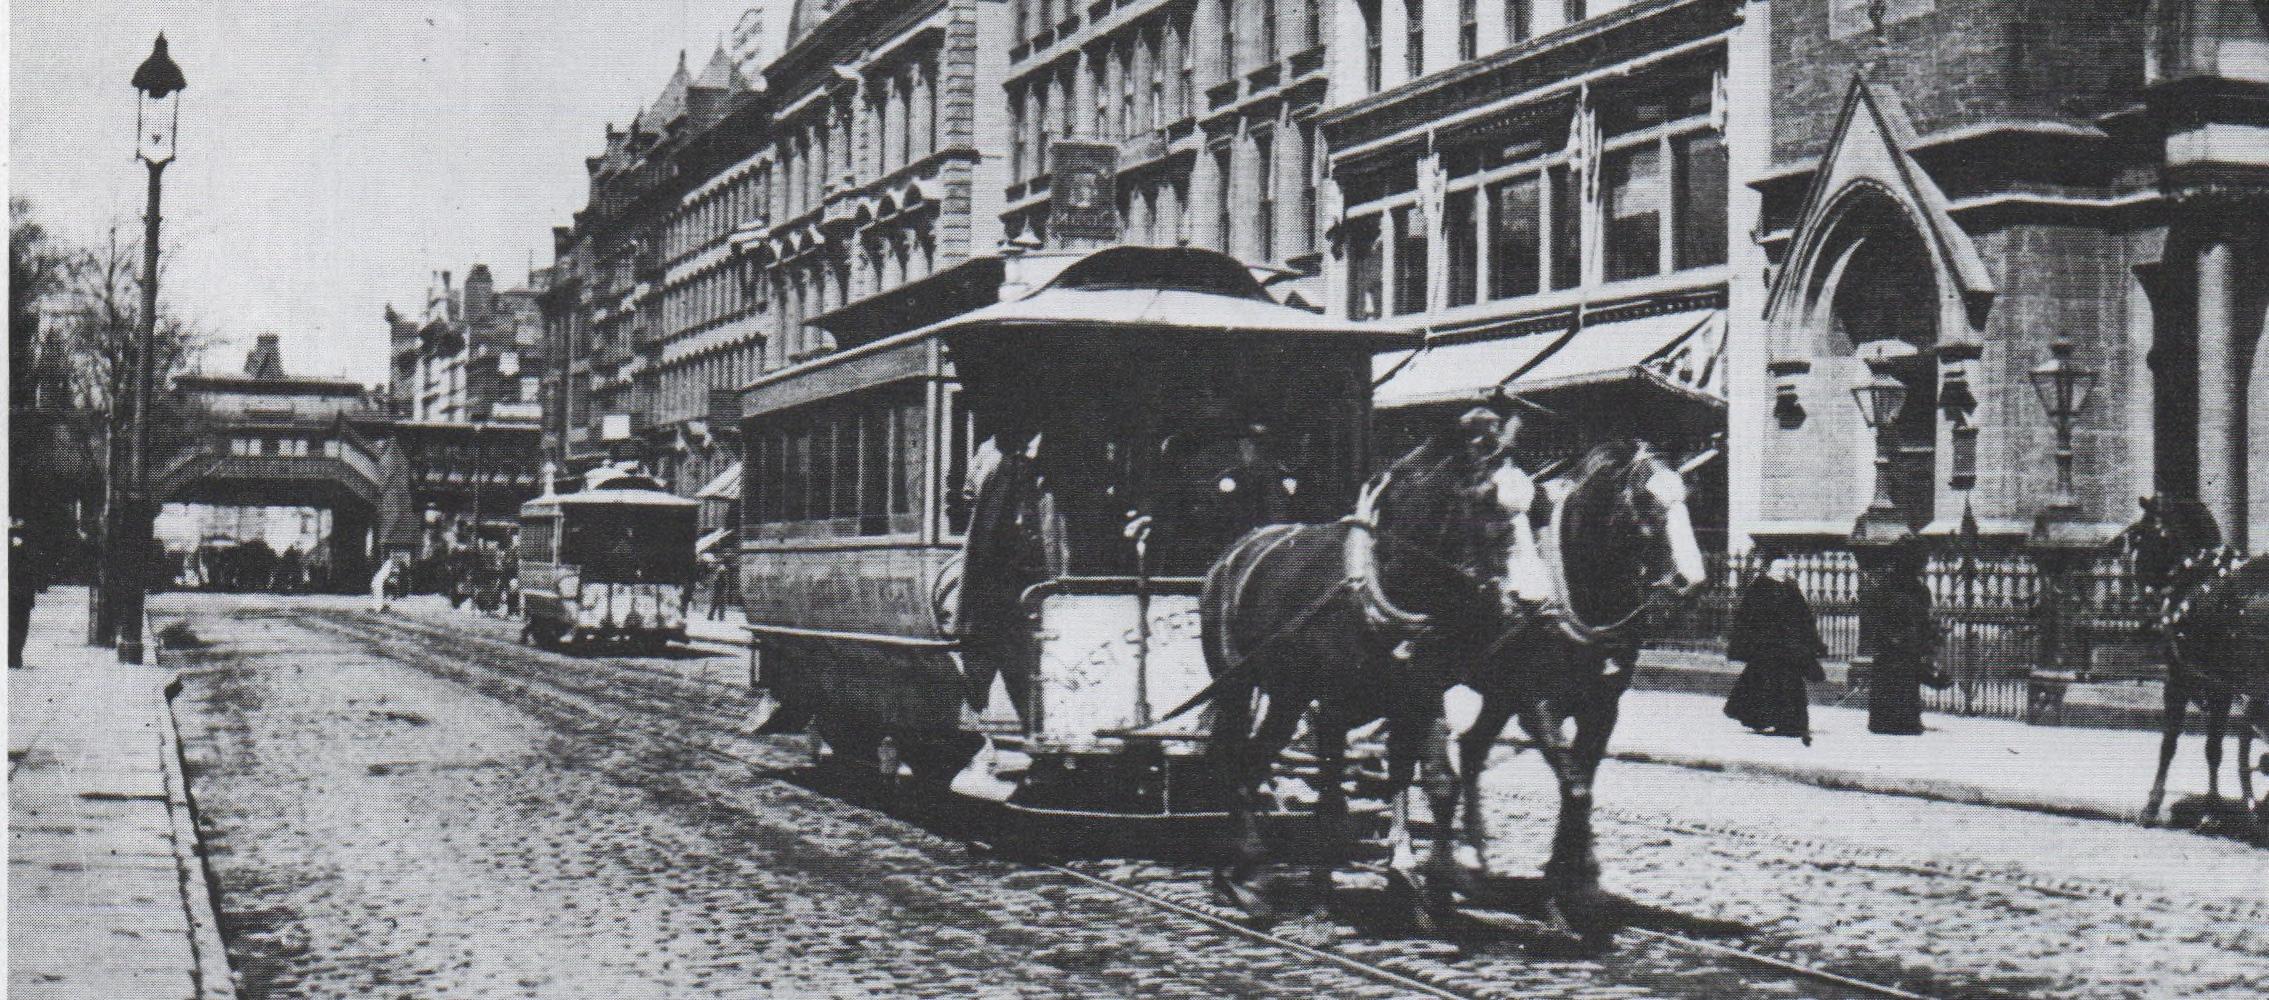 Elizabeth Jennings and the Desegregation of Public Transportation in New York City